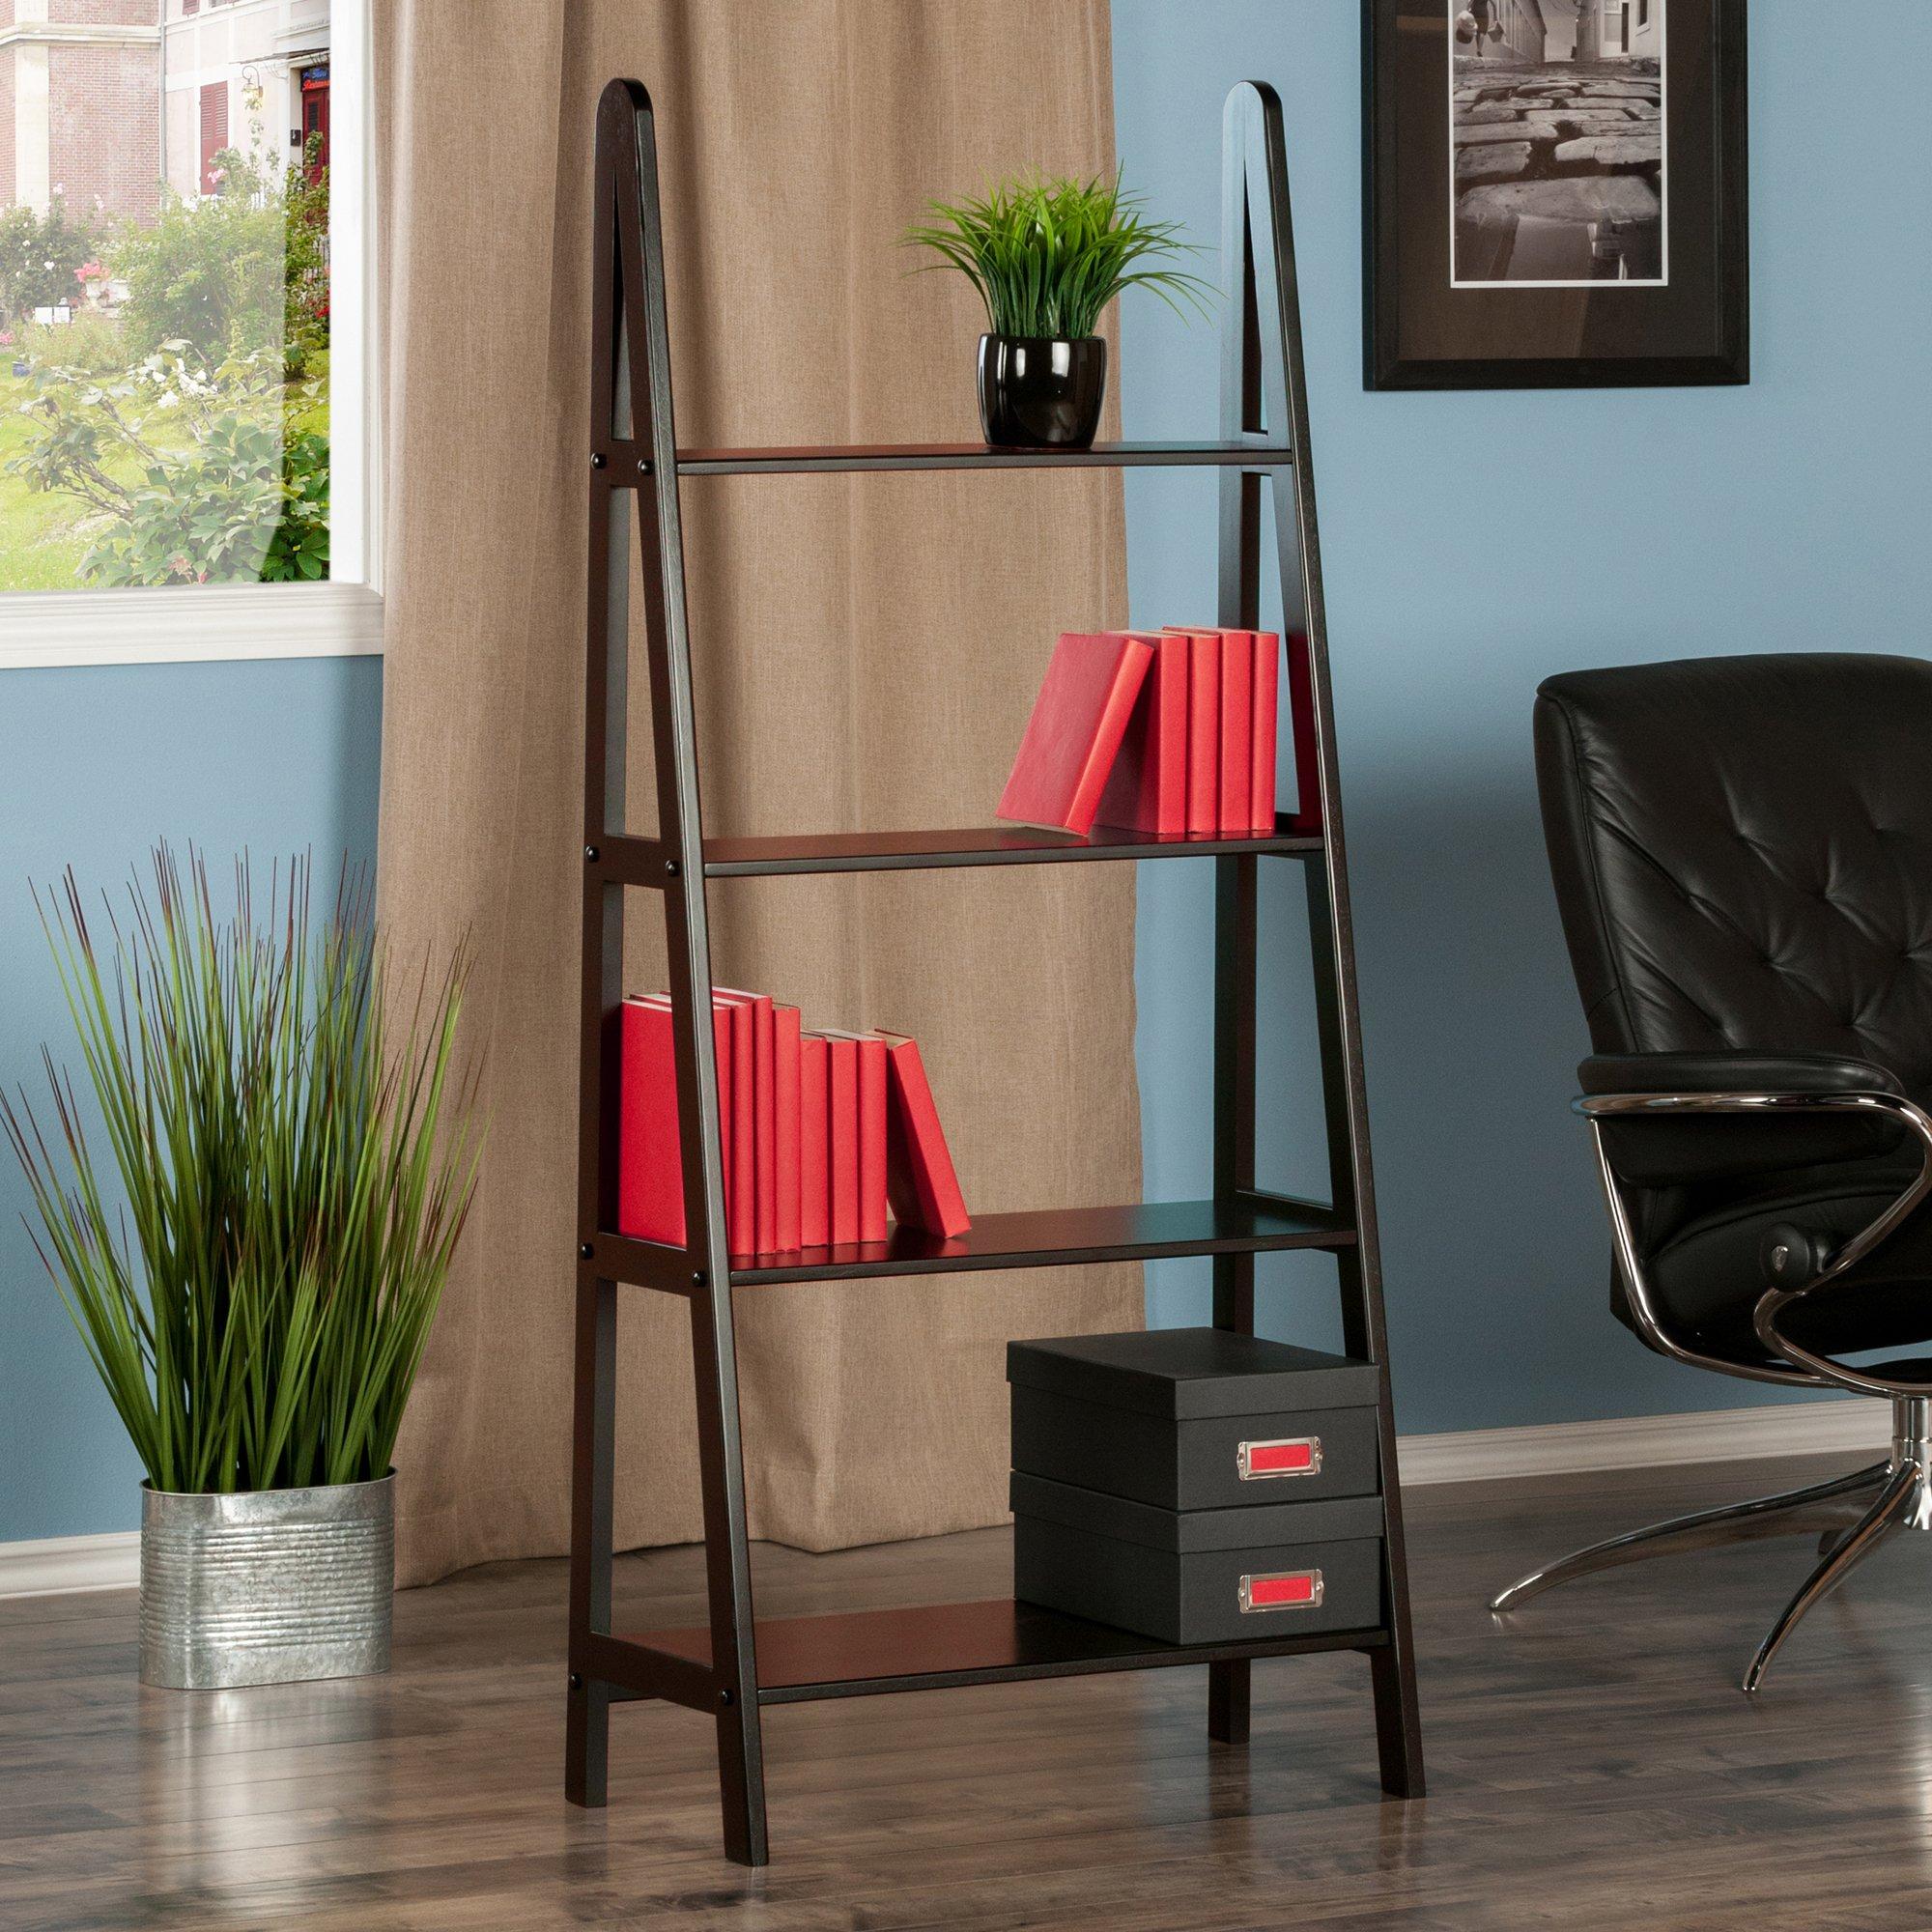 Winsome Wood 4-Tier A-Frame Shelf, Dark Espresso by Winsome Wood (Image #2)